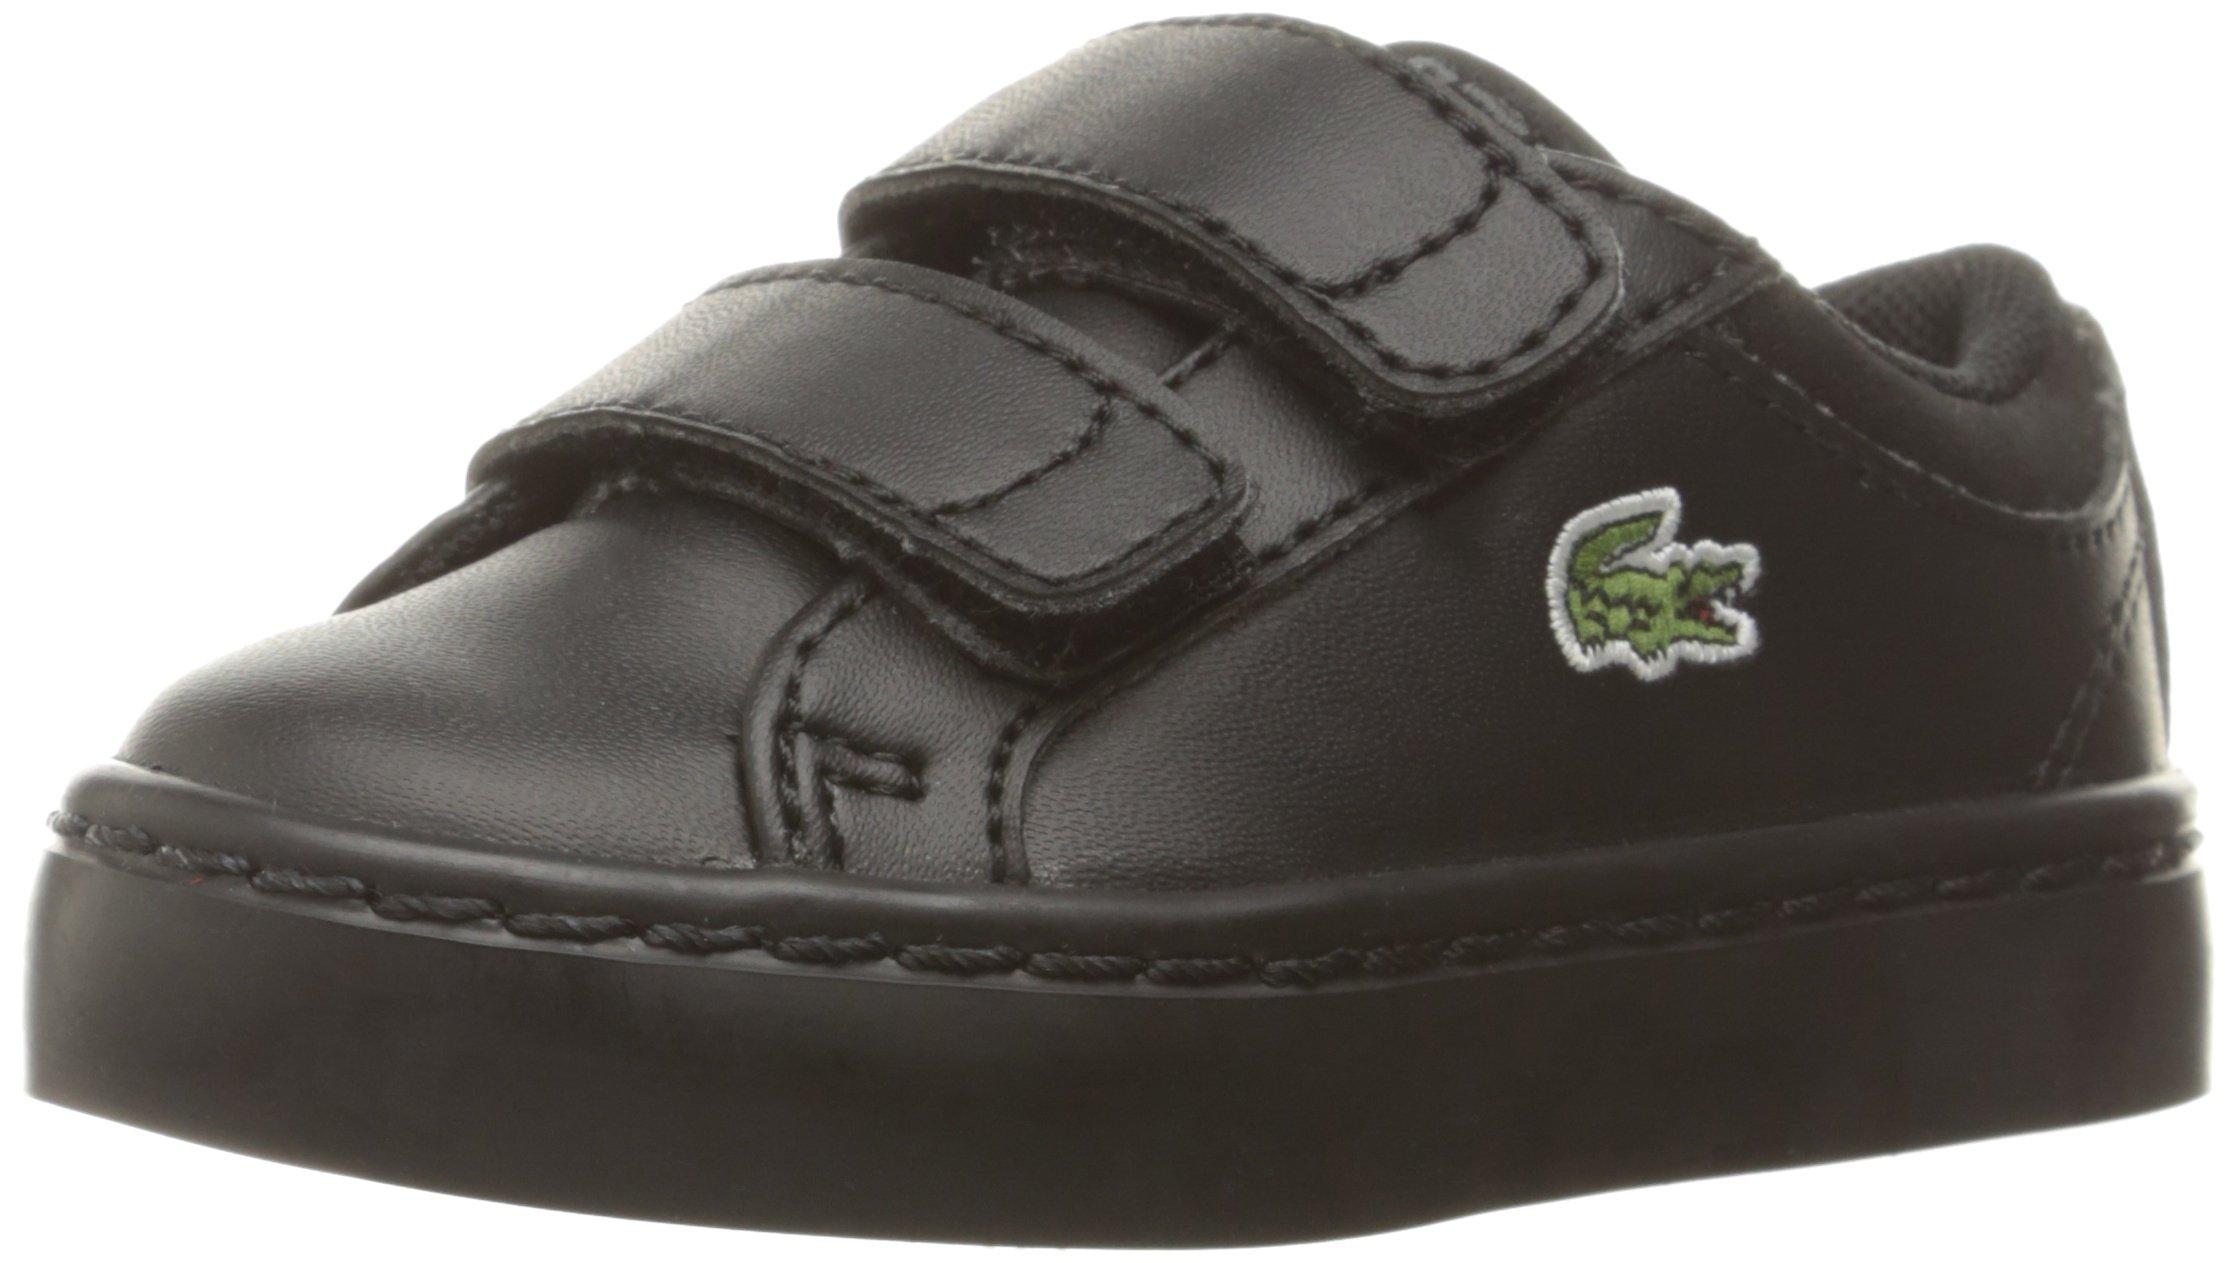 c2f781f6c Galleon - Lacoste Straightset (Baby) Sneaker